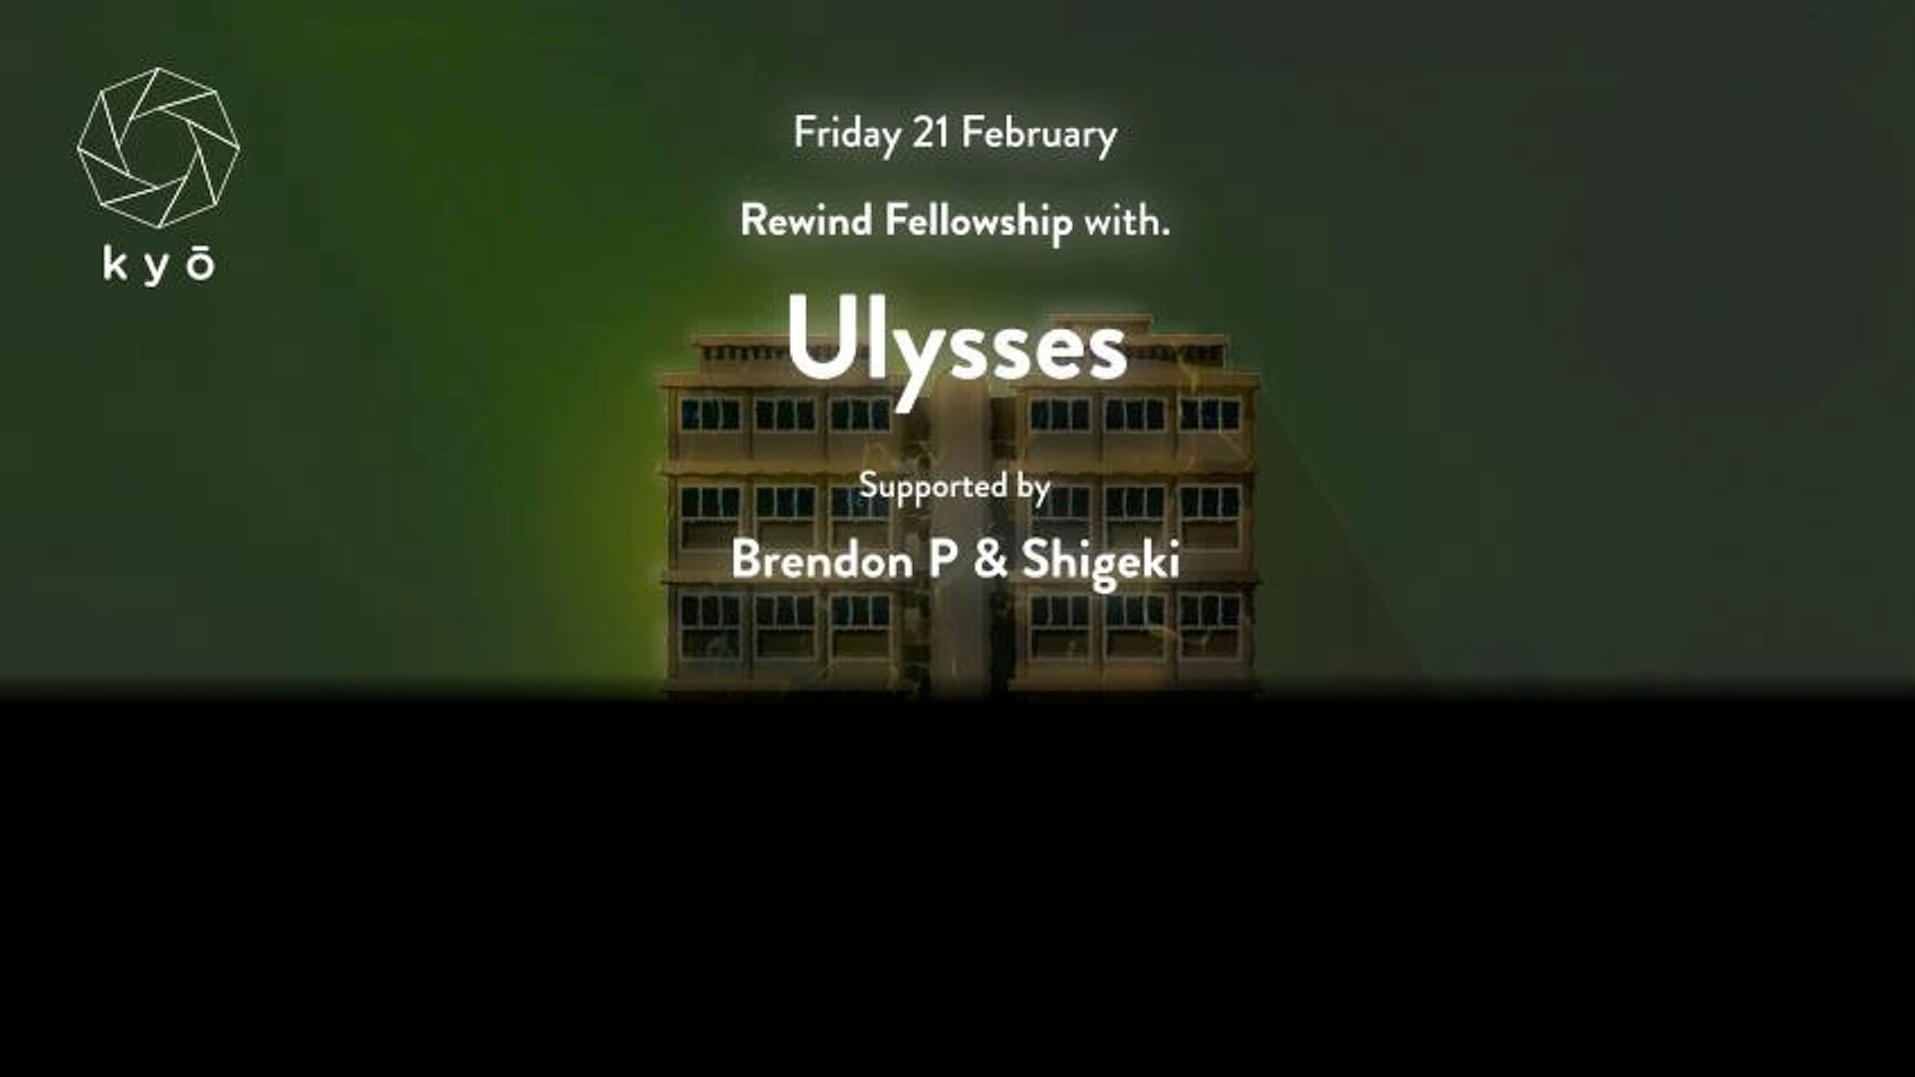 REWIND ft. Ulysses